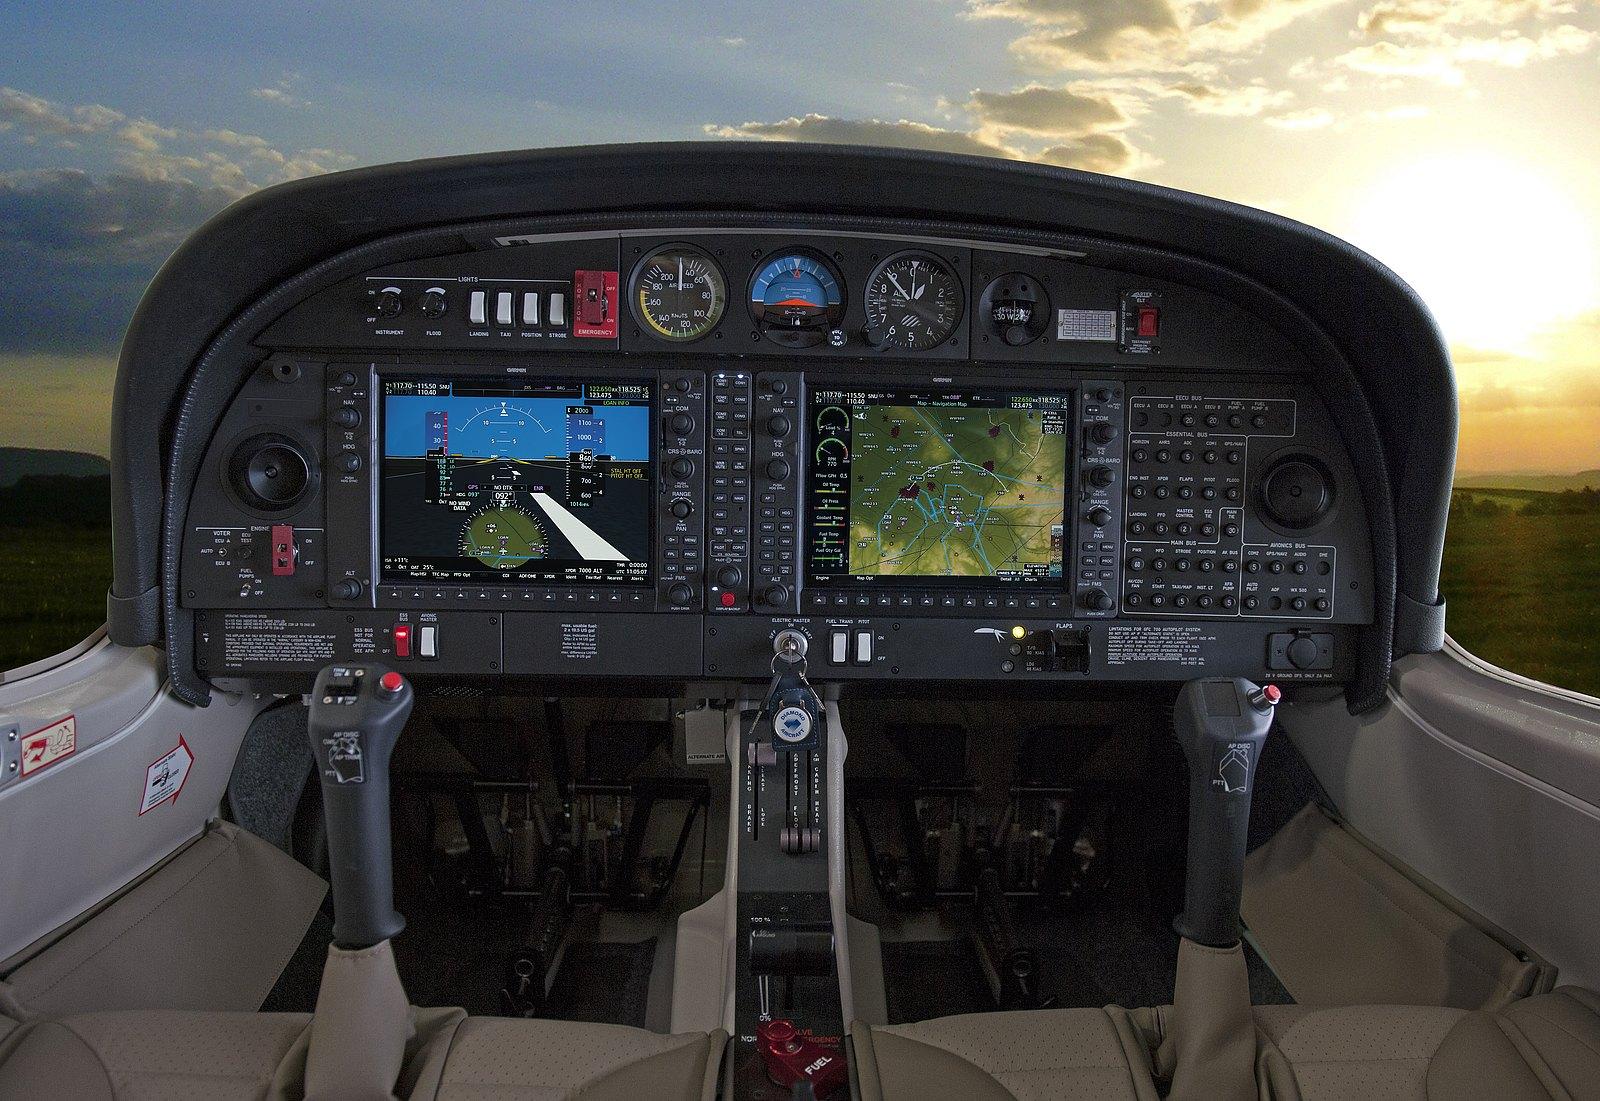 DA40 Series – Airborne innovation - Diamond Aircraft Industries